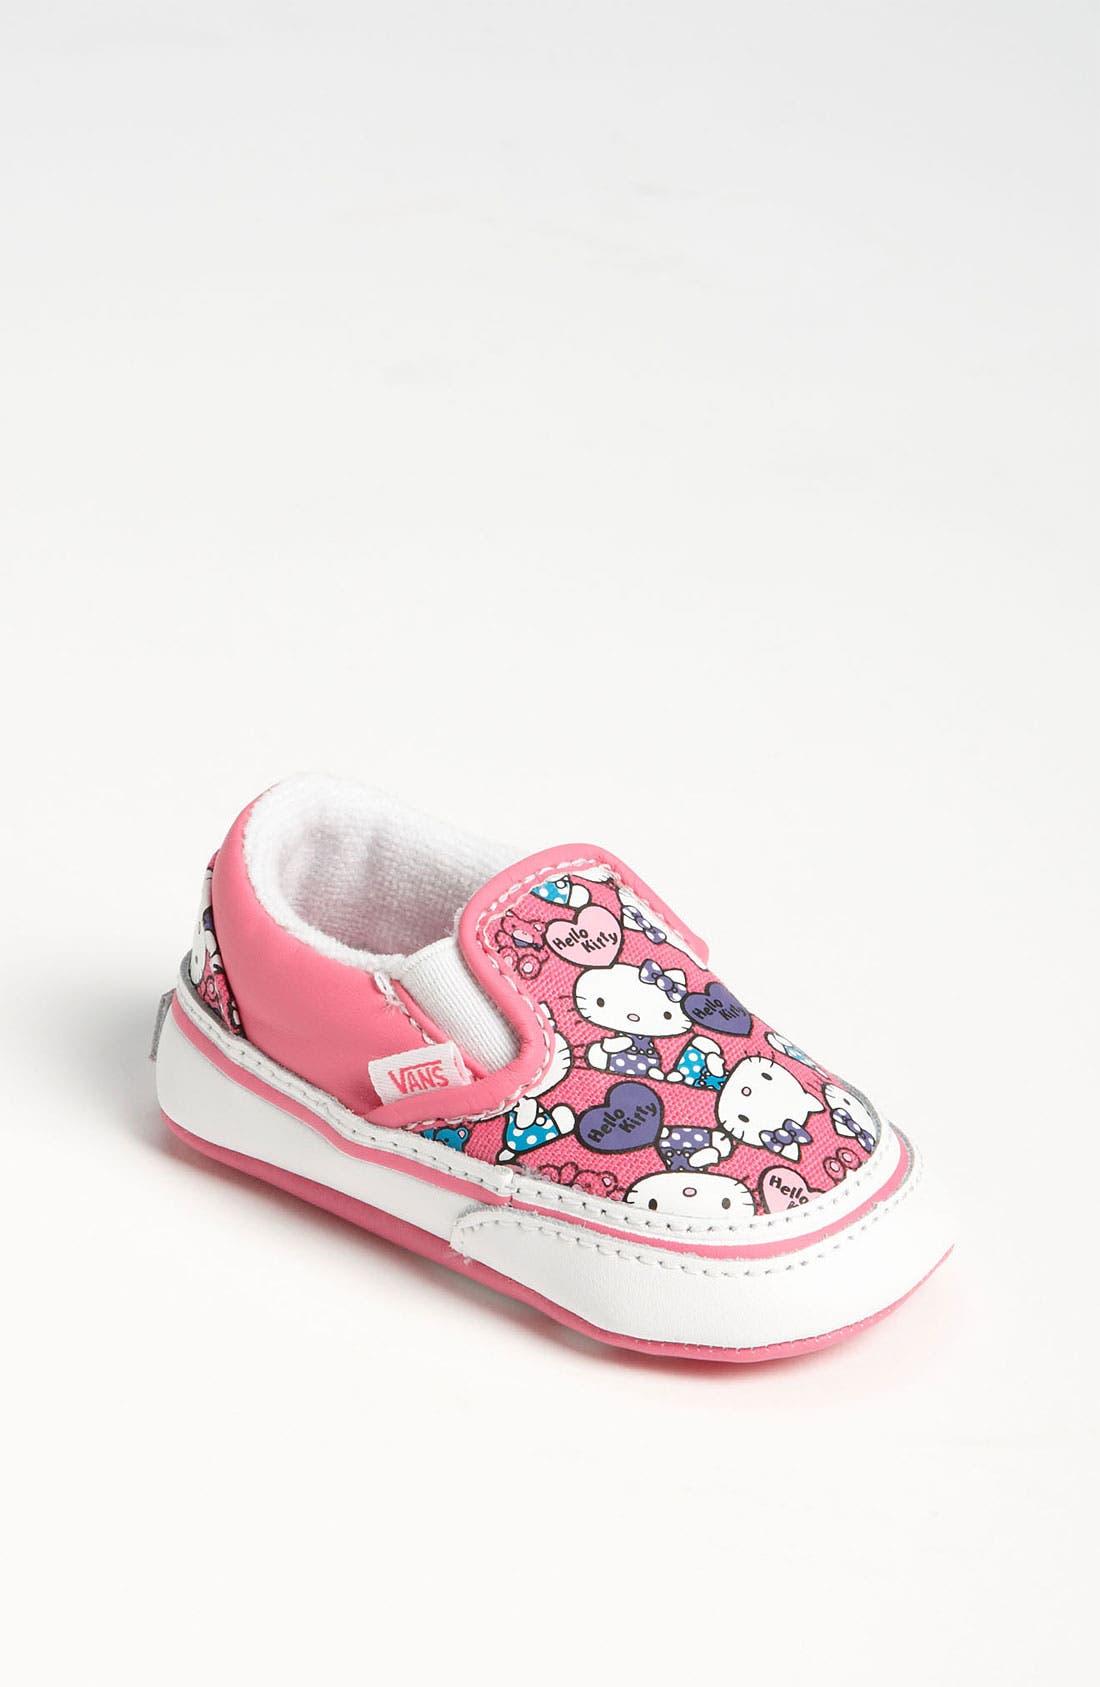 Alternate Image 1 Selected - Vans 'Classic - Hello Kitty®' Crib Shoe (Infant)